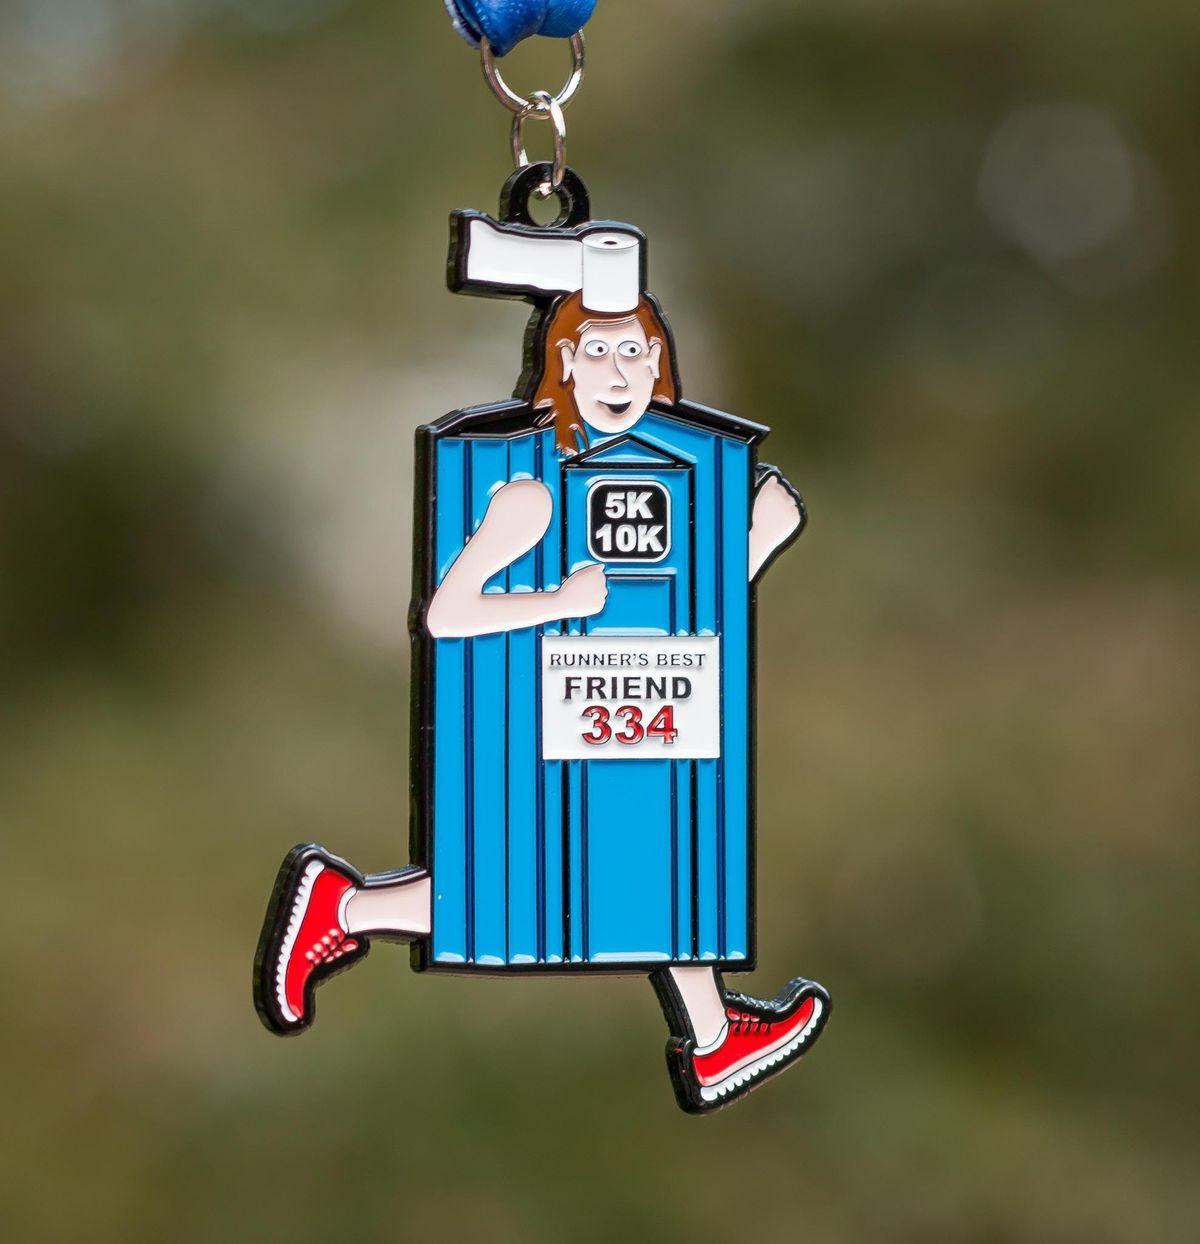 World Toilet Day 5K & 10K - Runners Best Friend - Albany